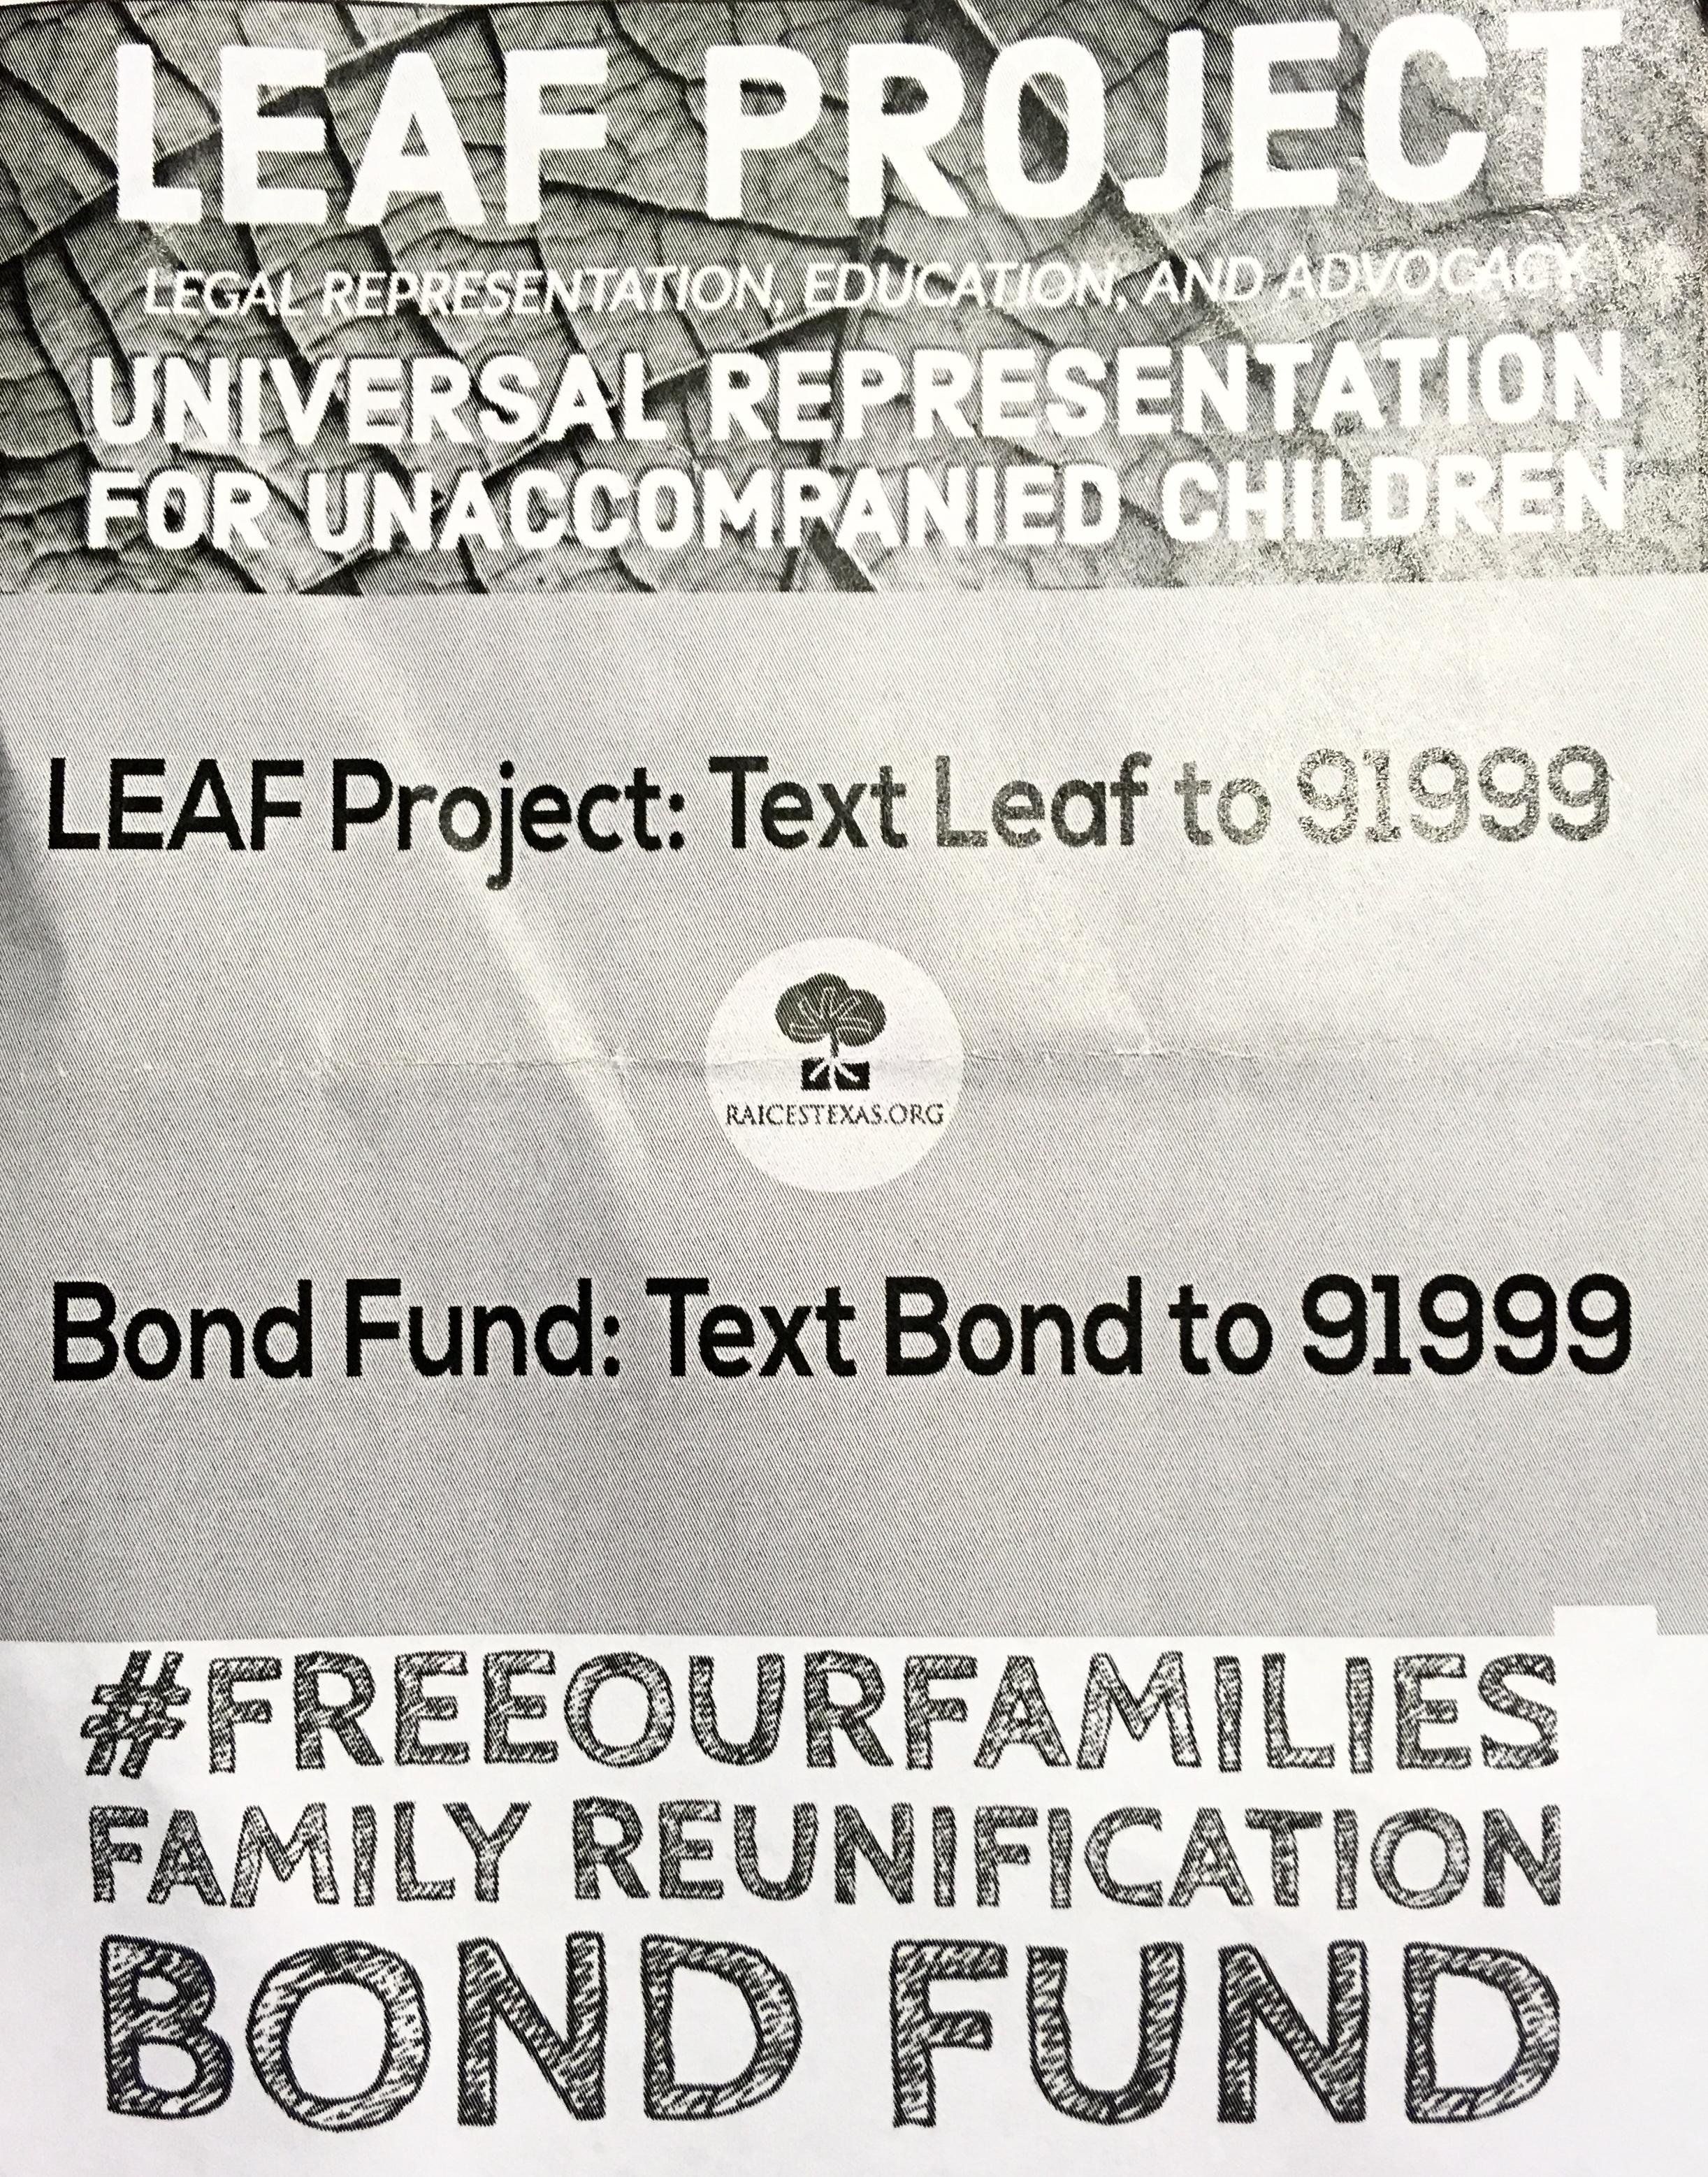 RAICES: LEAF Project for Universal Representation for Unaccompanied Children